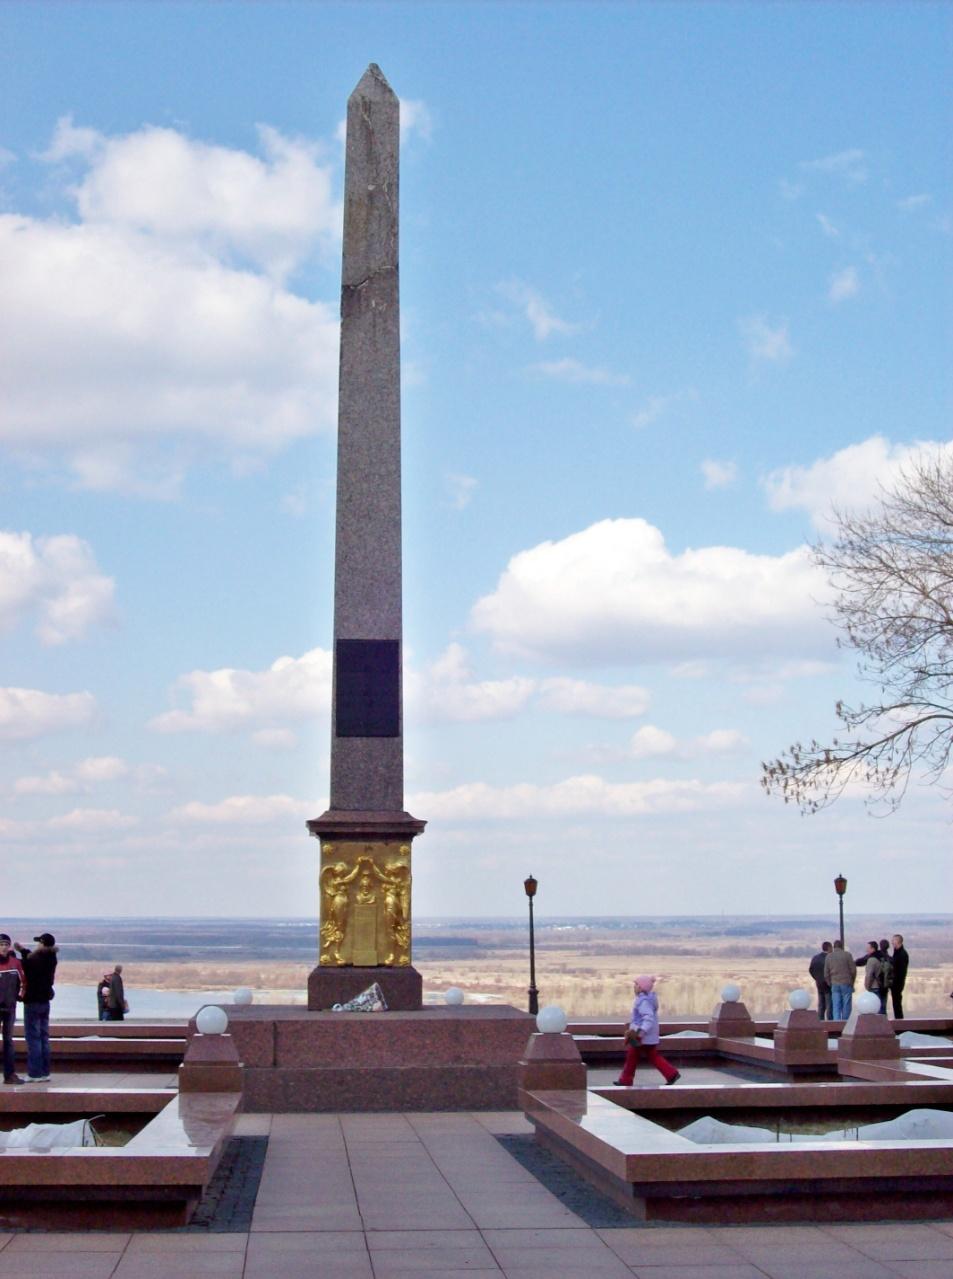 http://upload.wikimedia.org/wikipedia/commons/5/54/Obelisk_in_honor_of_Minin_and_Pozharskogo_in_the_Nizhni_Novgorod_Kremlin.jpg